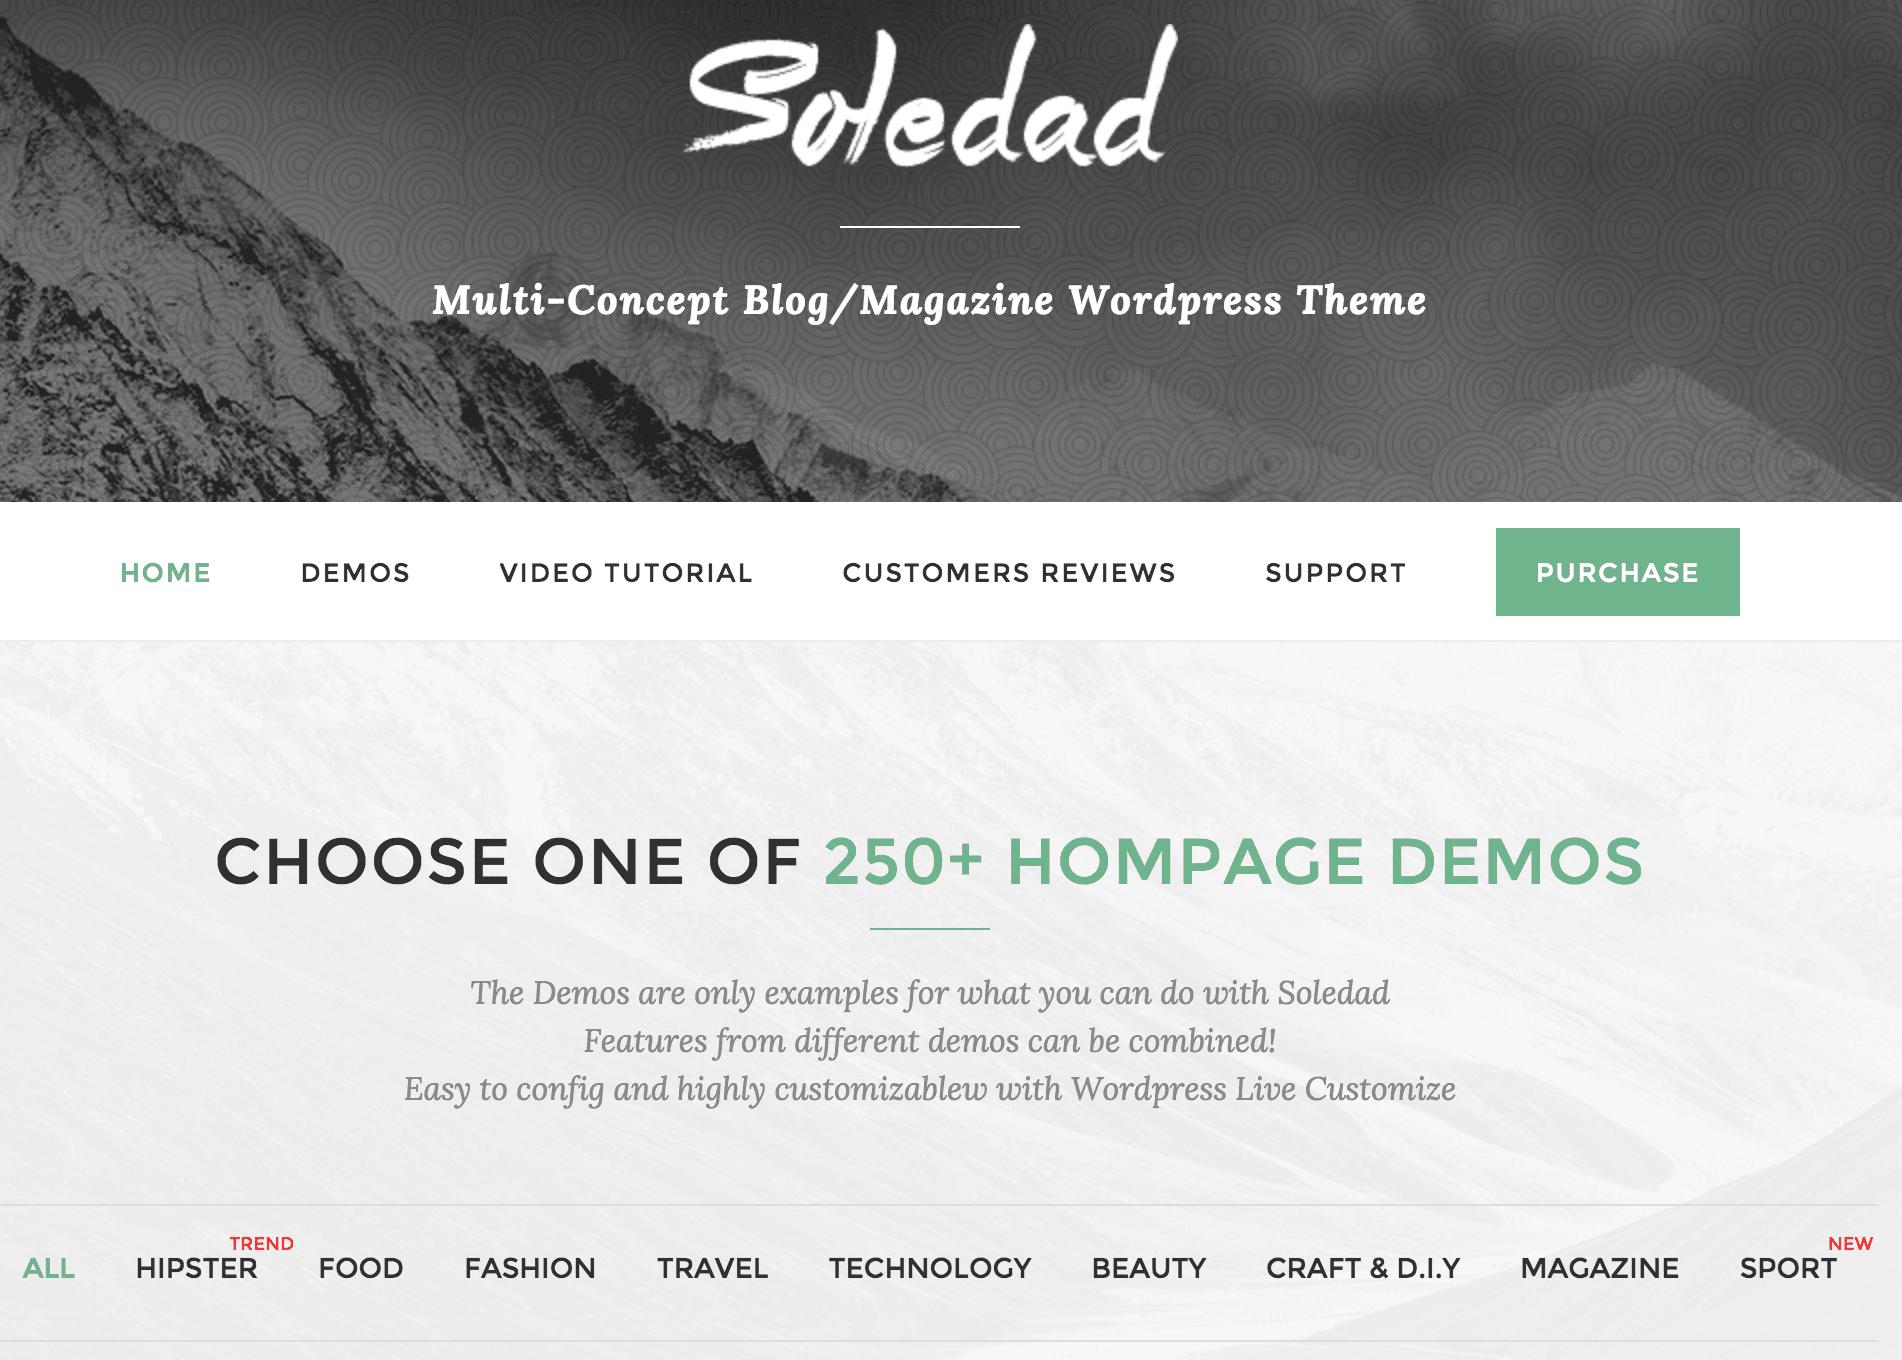 A screenshot of the Soledad theme.